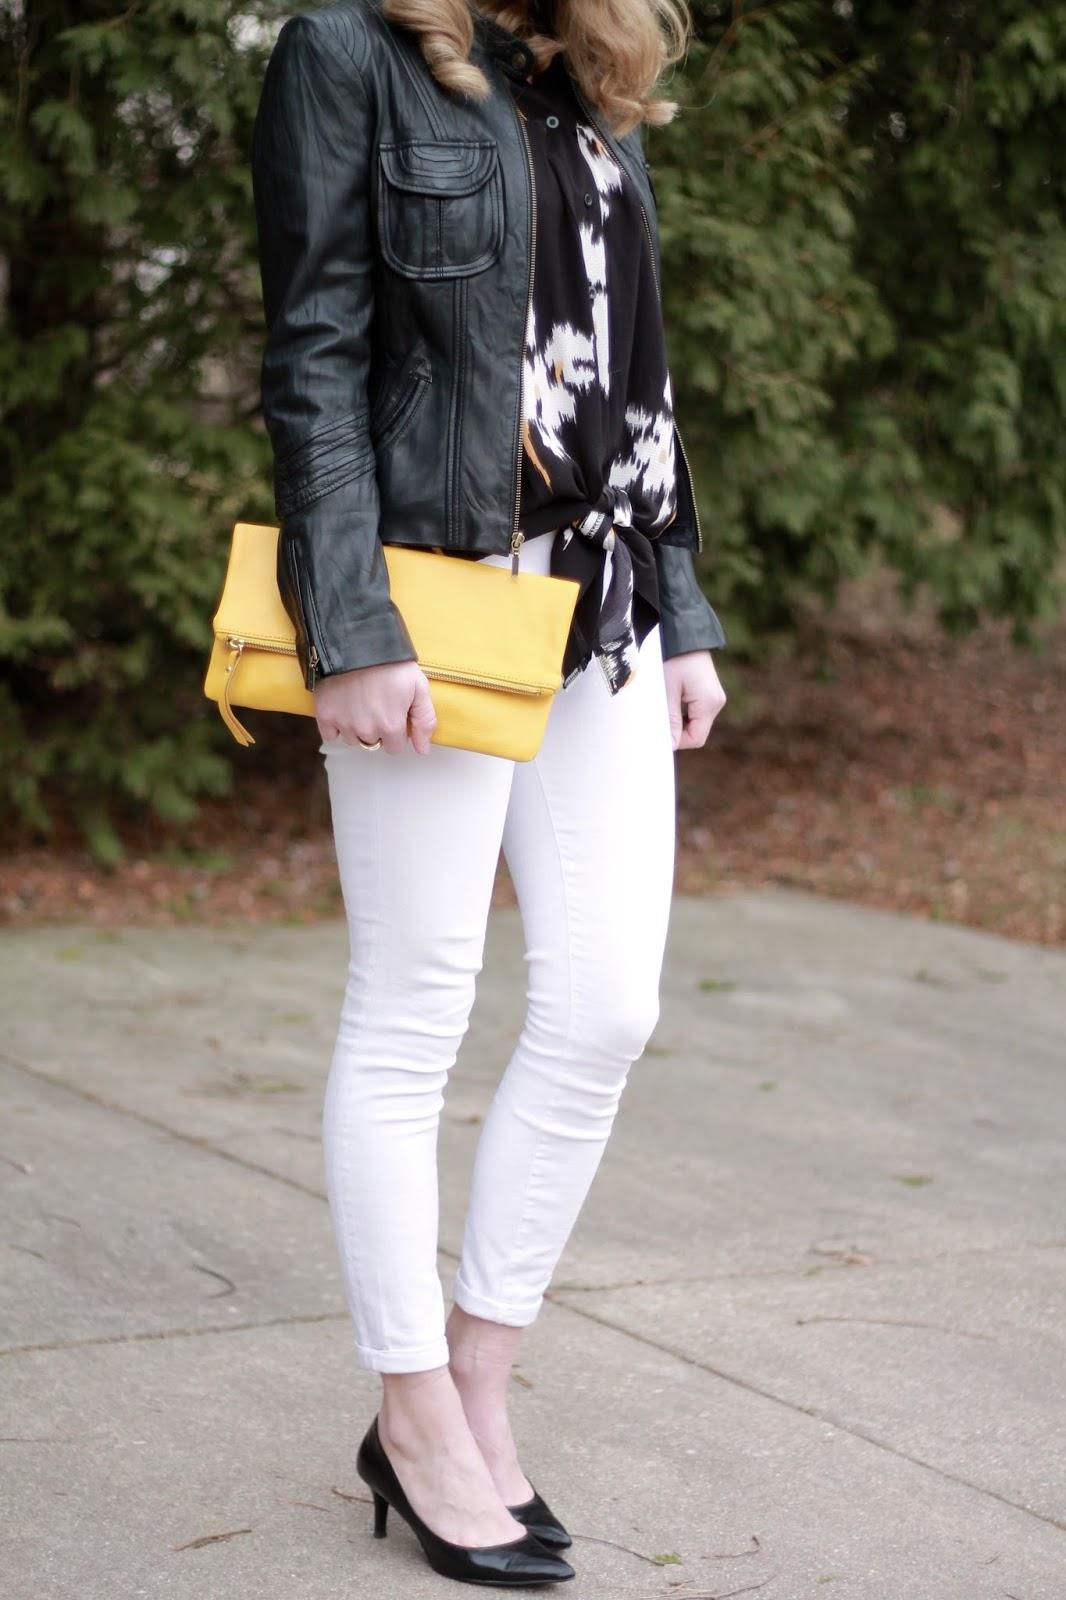 black floral tie top, black moto jacket, white jeans, black heels, yellow clutch